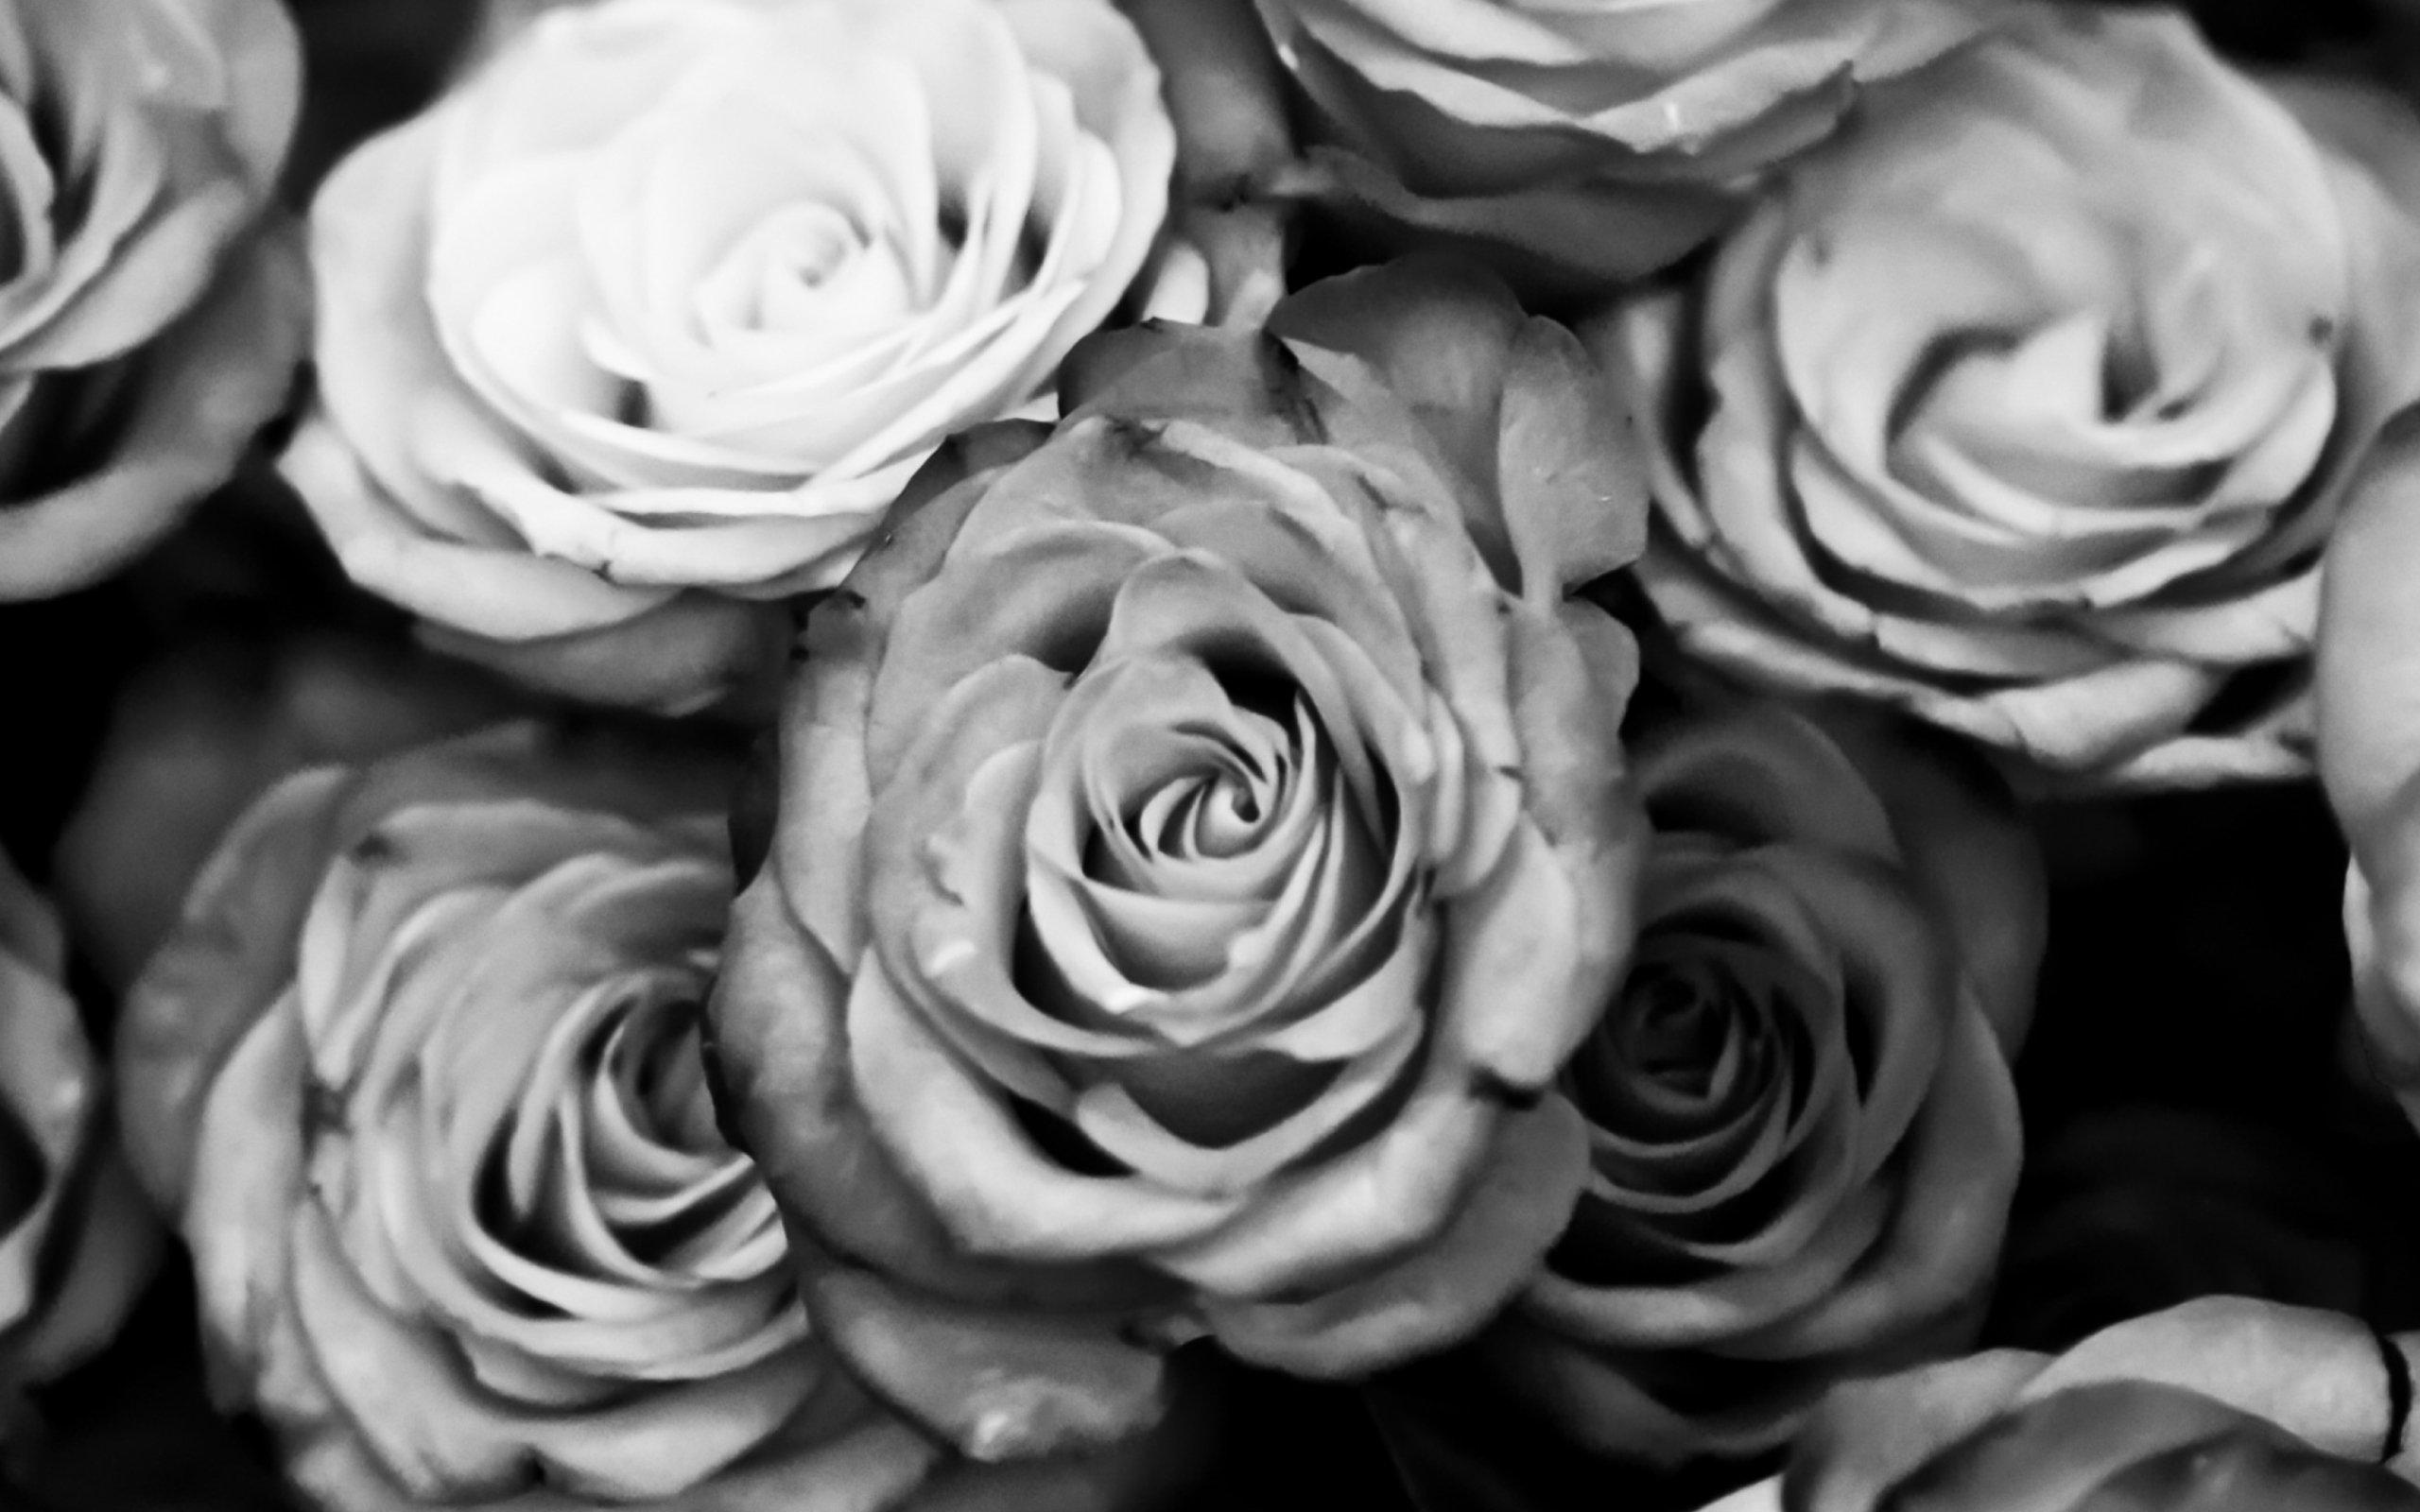 Черно белые картинки в цвете